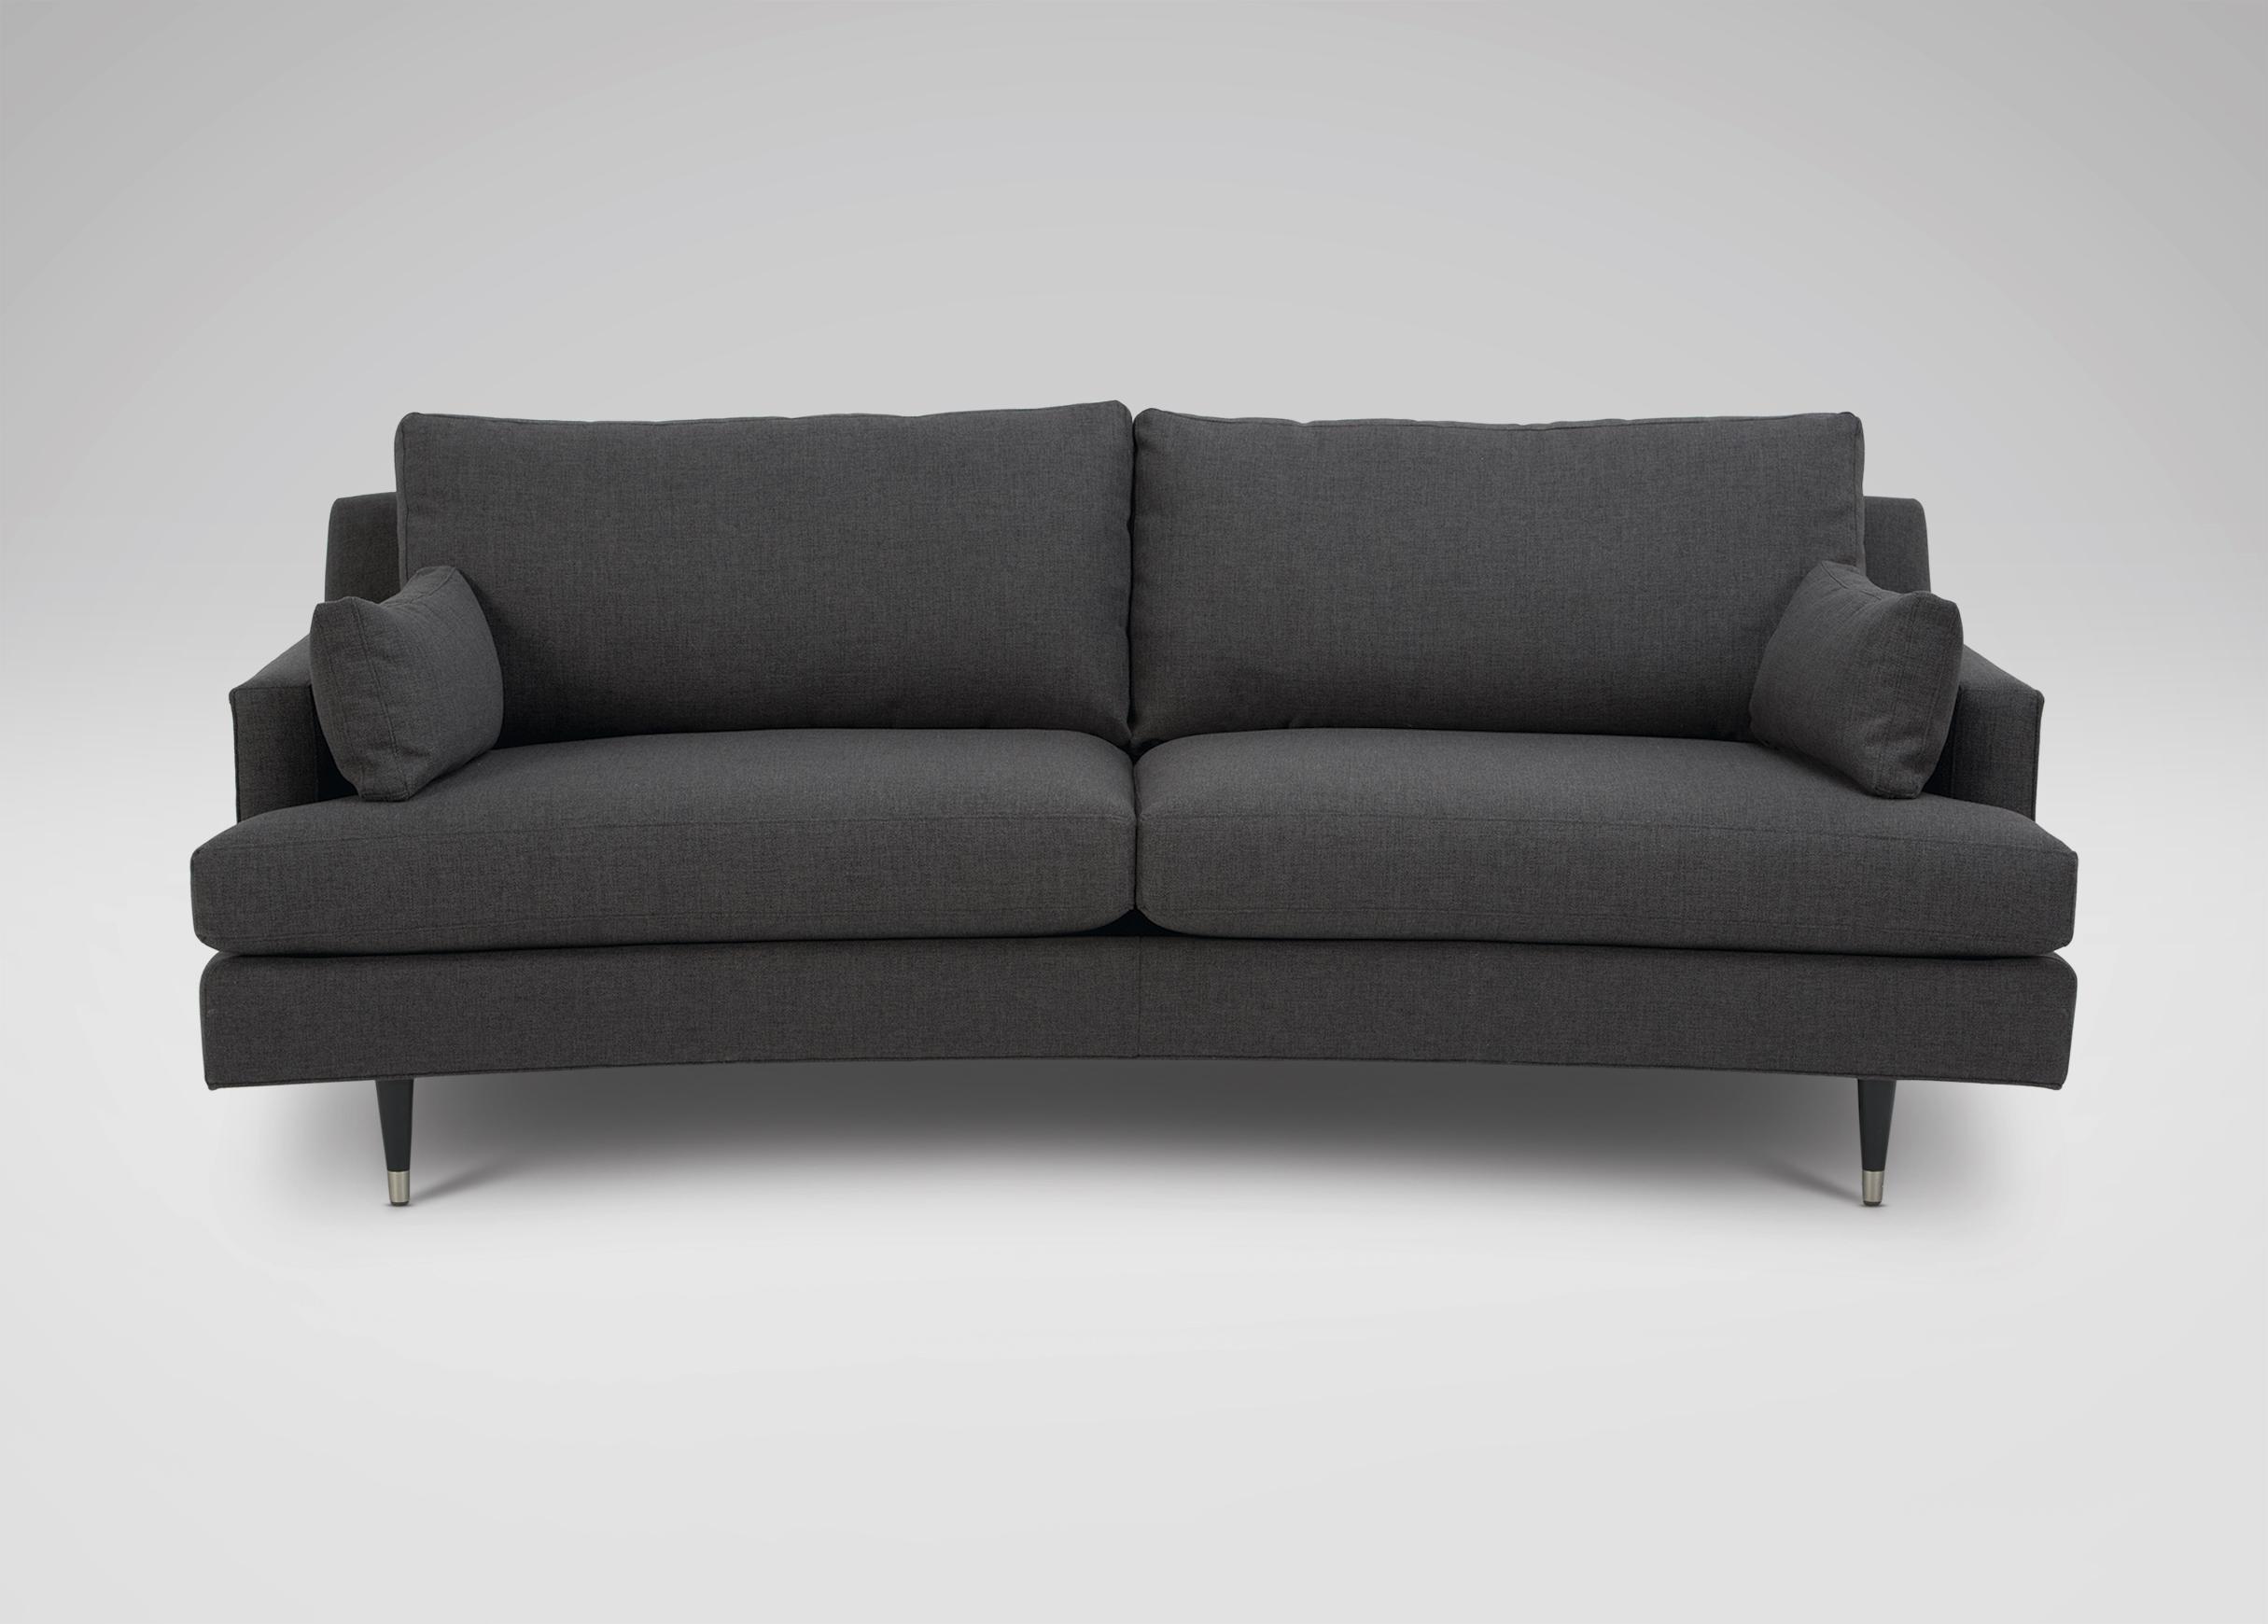 chadwick sofa donate 20 top sofas ideas